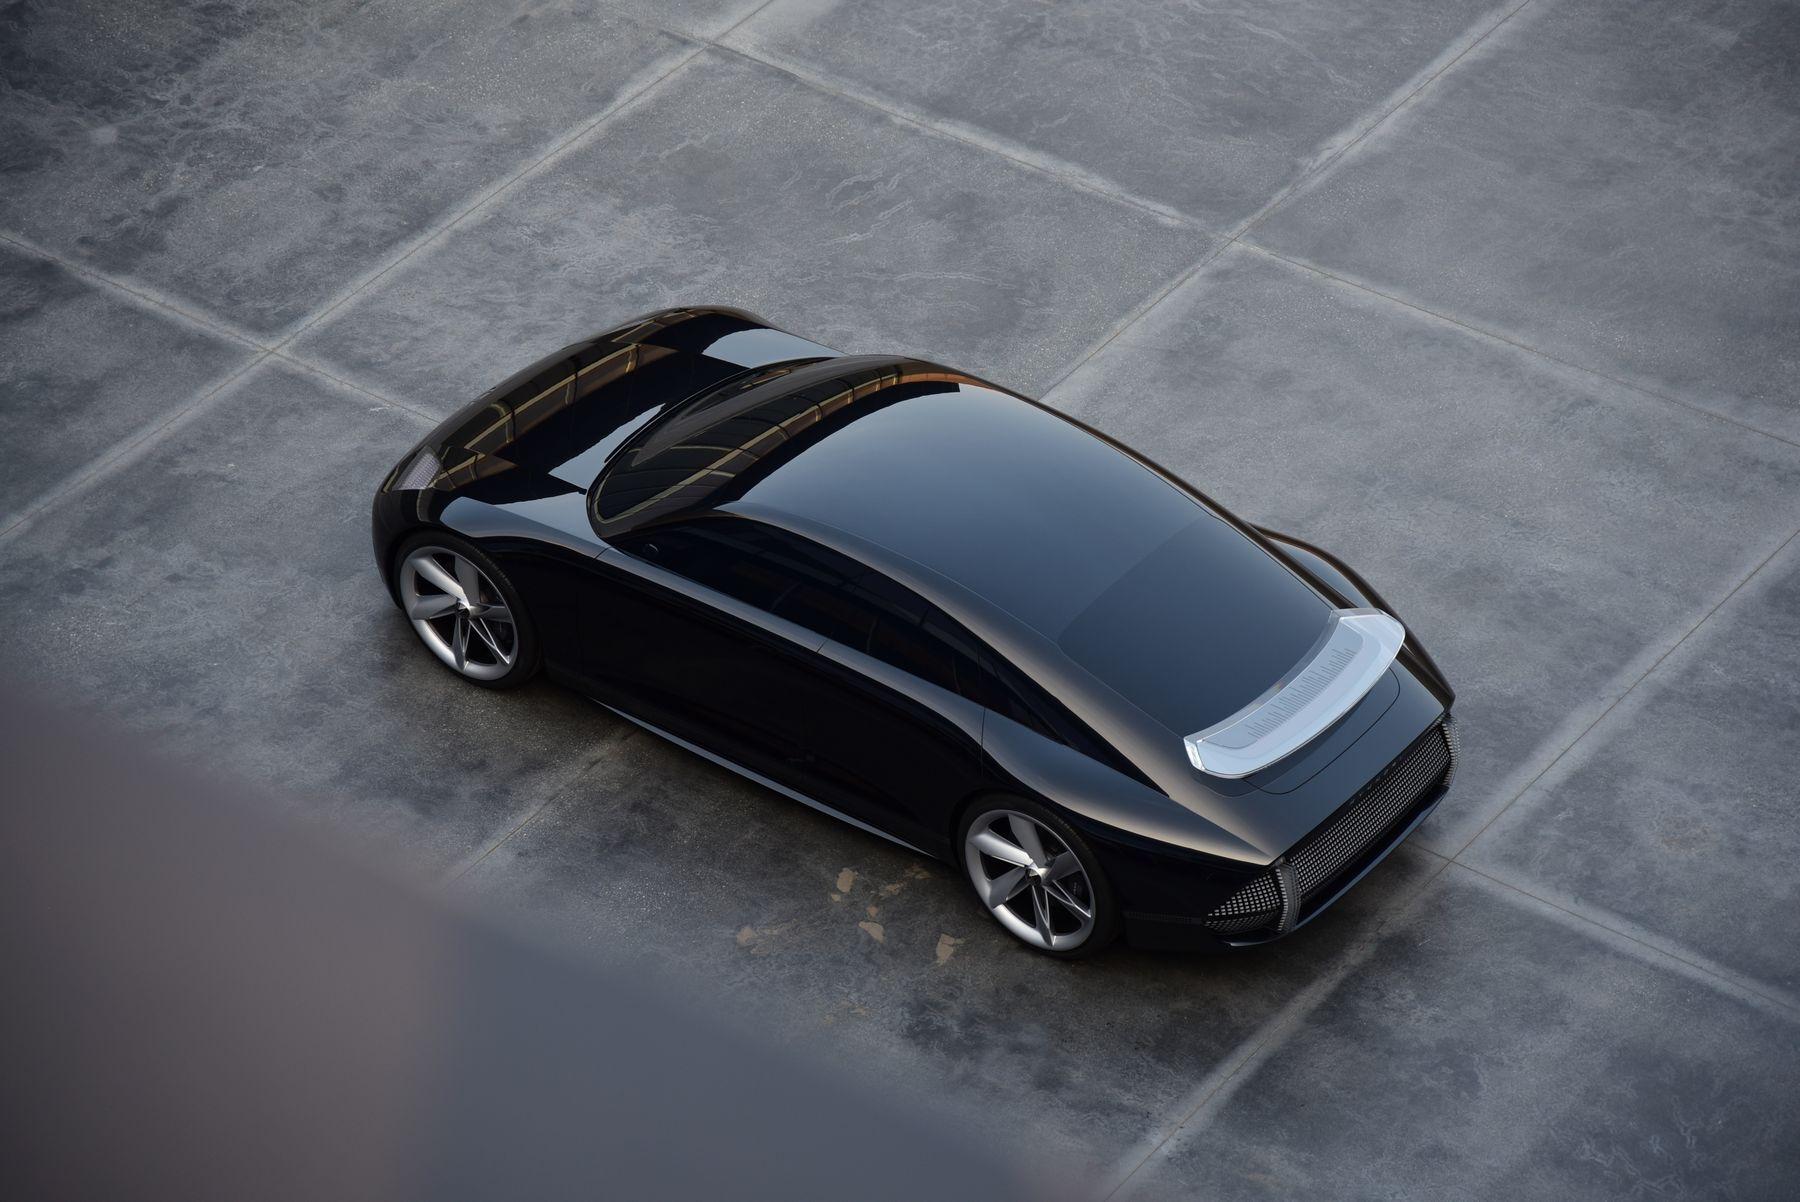 hyundai prophecy concept electric car 1 2